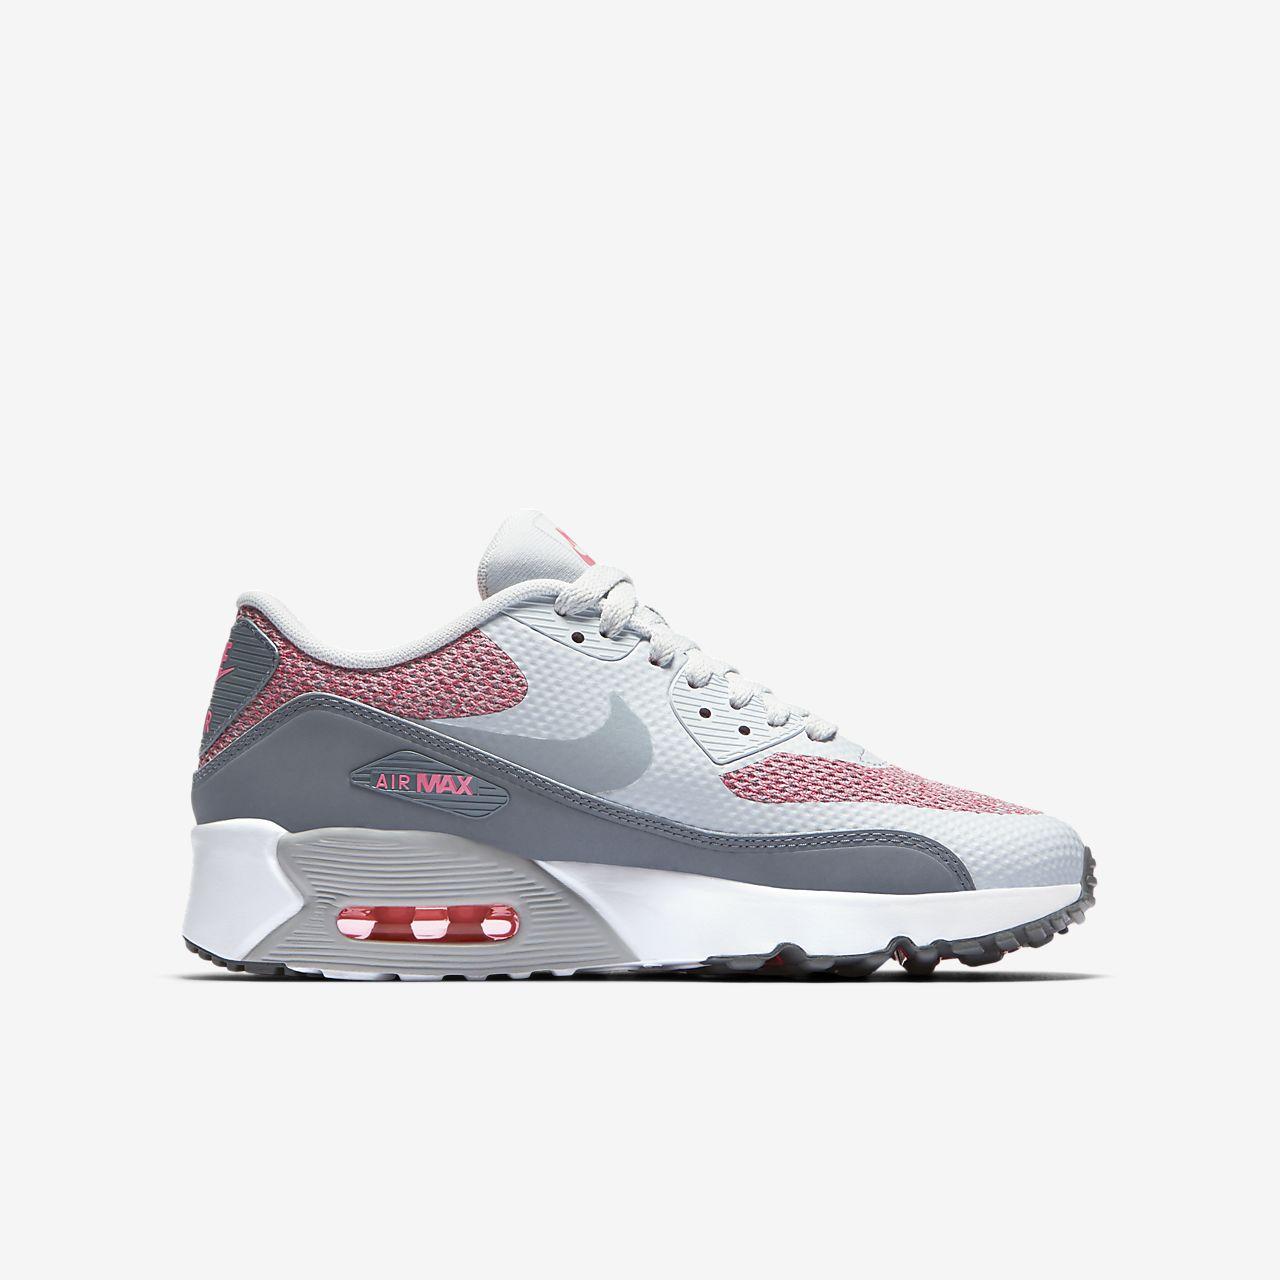 ... Nike Air Max 90 Ultra 2.0 SE Big Kids' Shoe